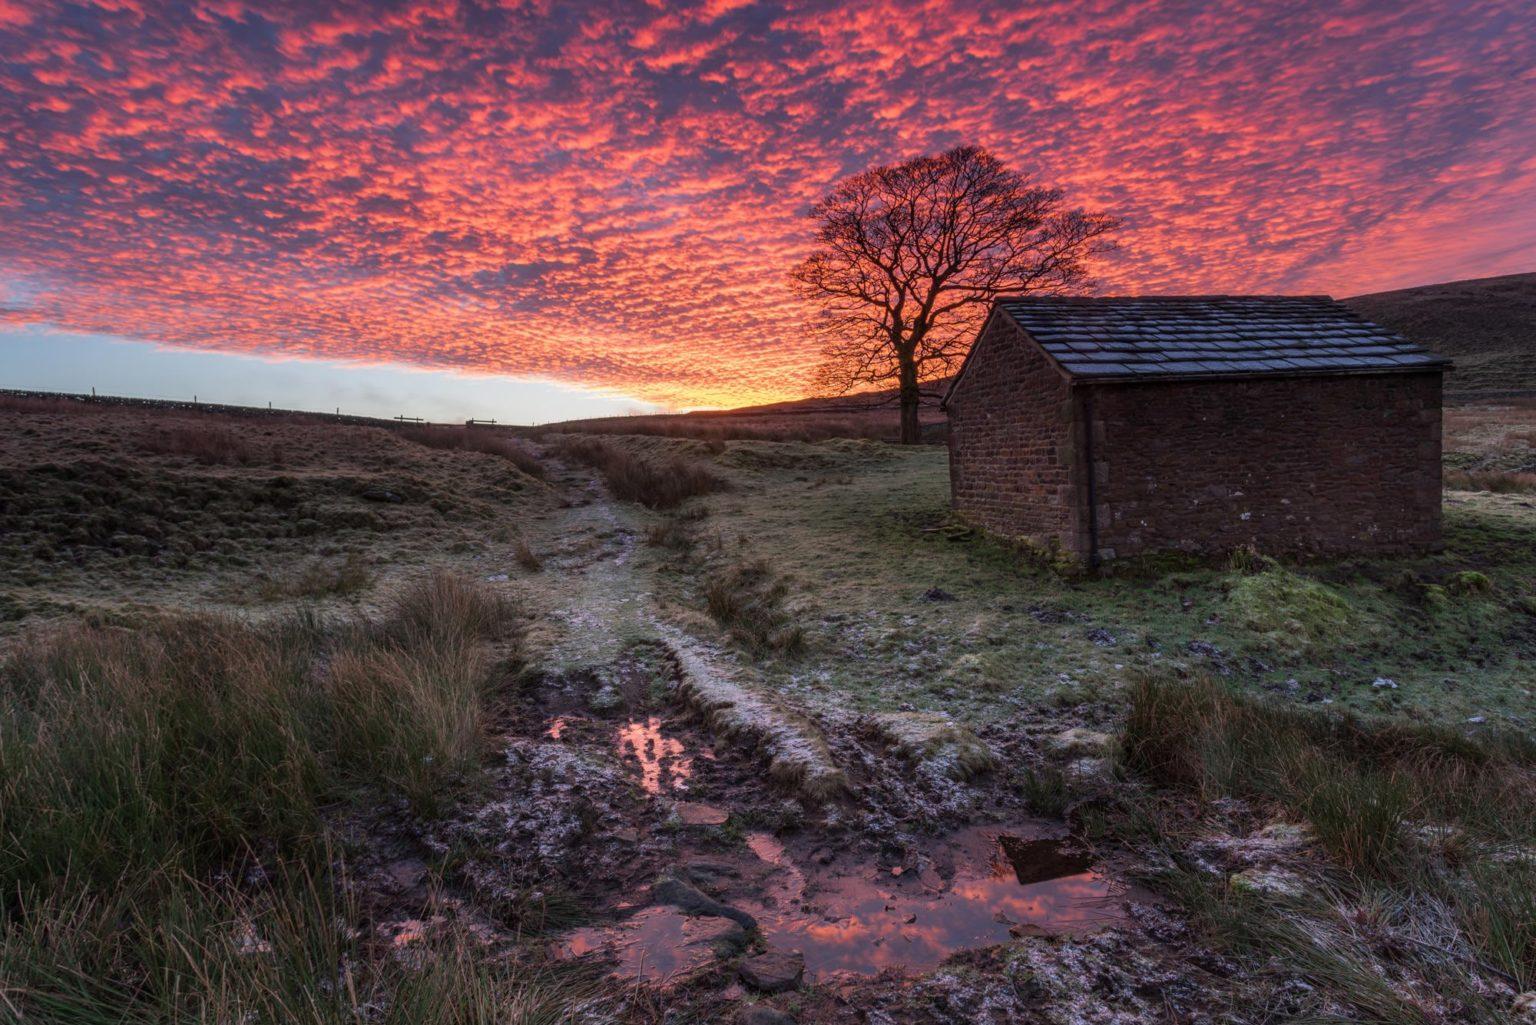 Wildboarclough Barn Fiery Sunrise - Peak District Photography